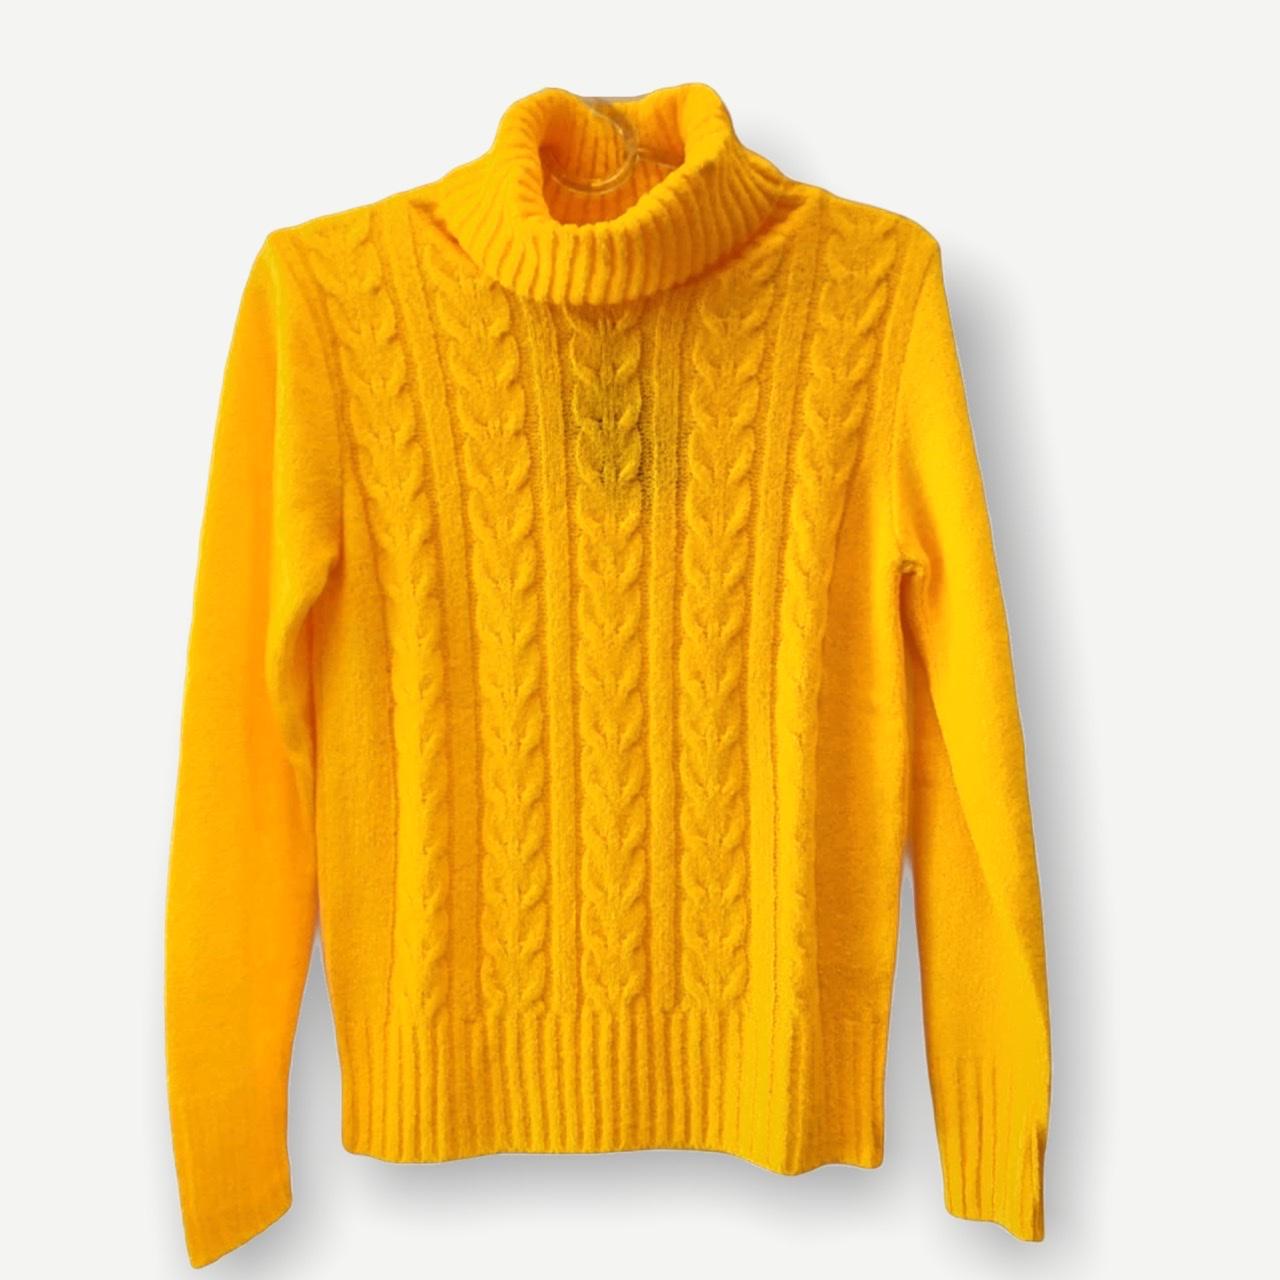 Blusa Rebeca amarela tricot  - Vivian Bógus